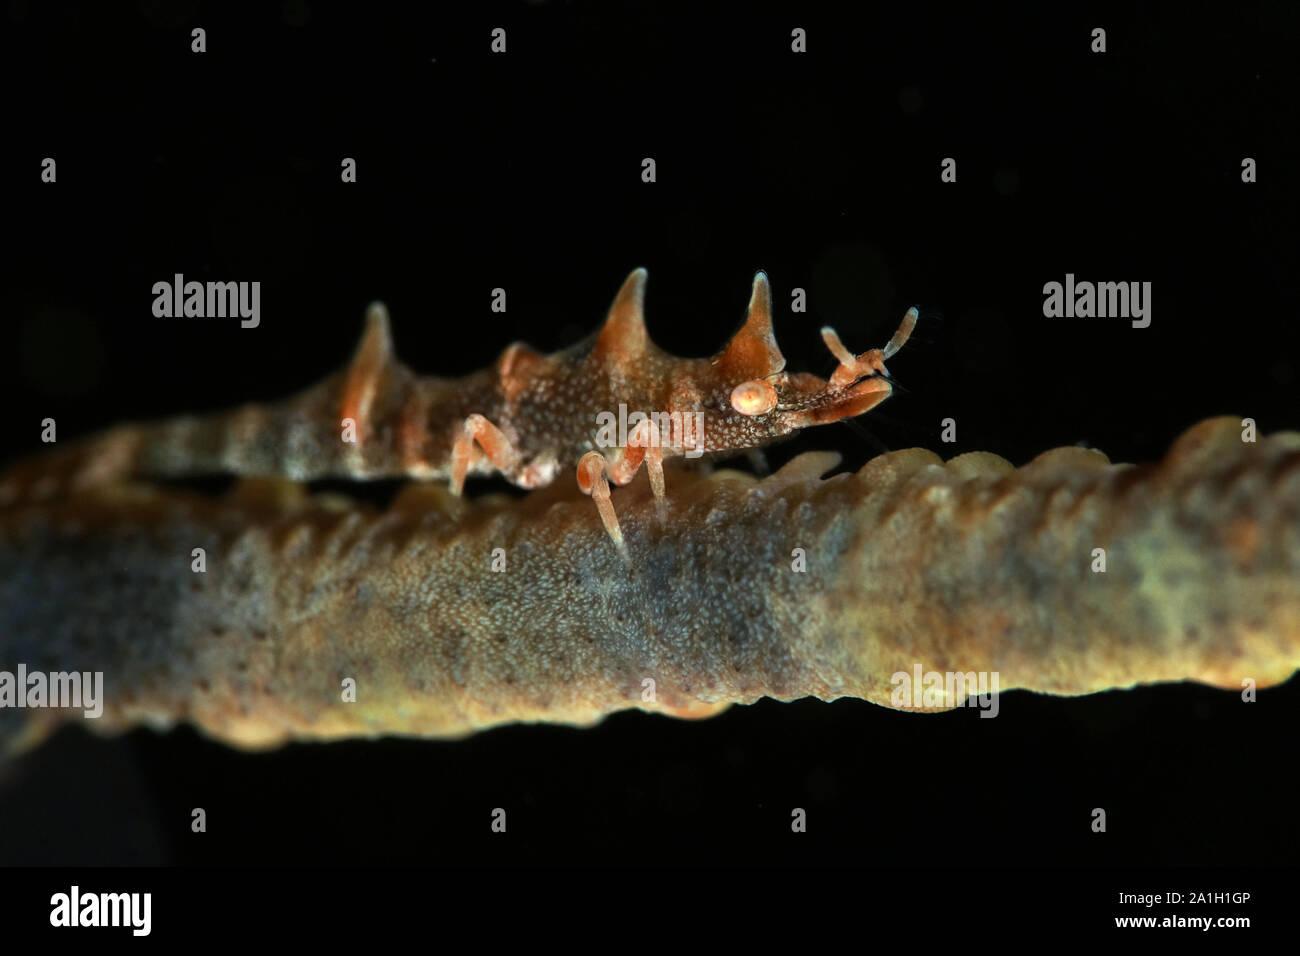 Dragon shrimp (Miropandalus hardingi). Picture was taken in Ambon, Indonesia Stock Photo